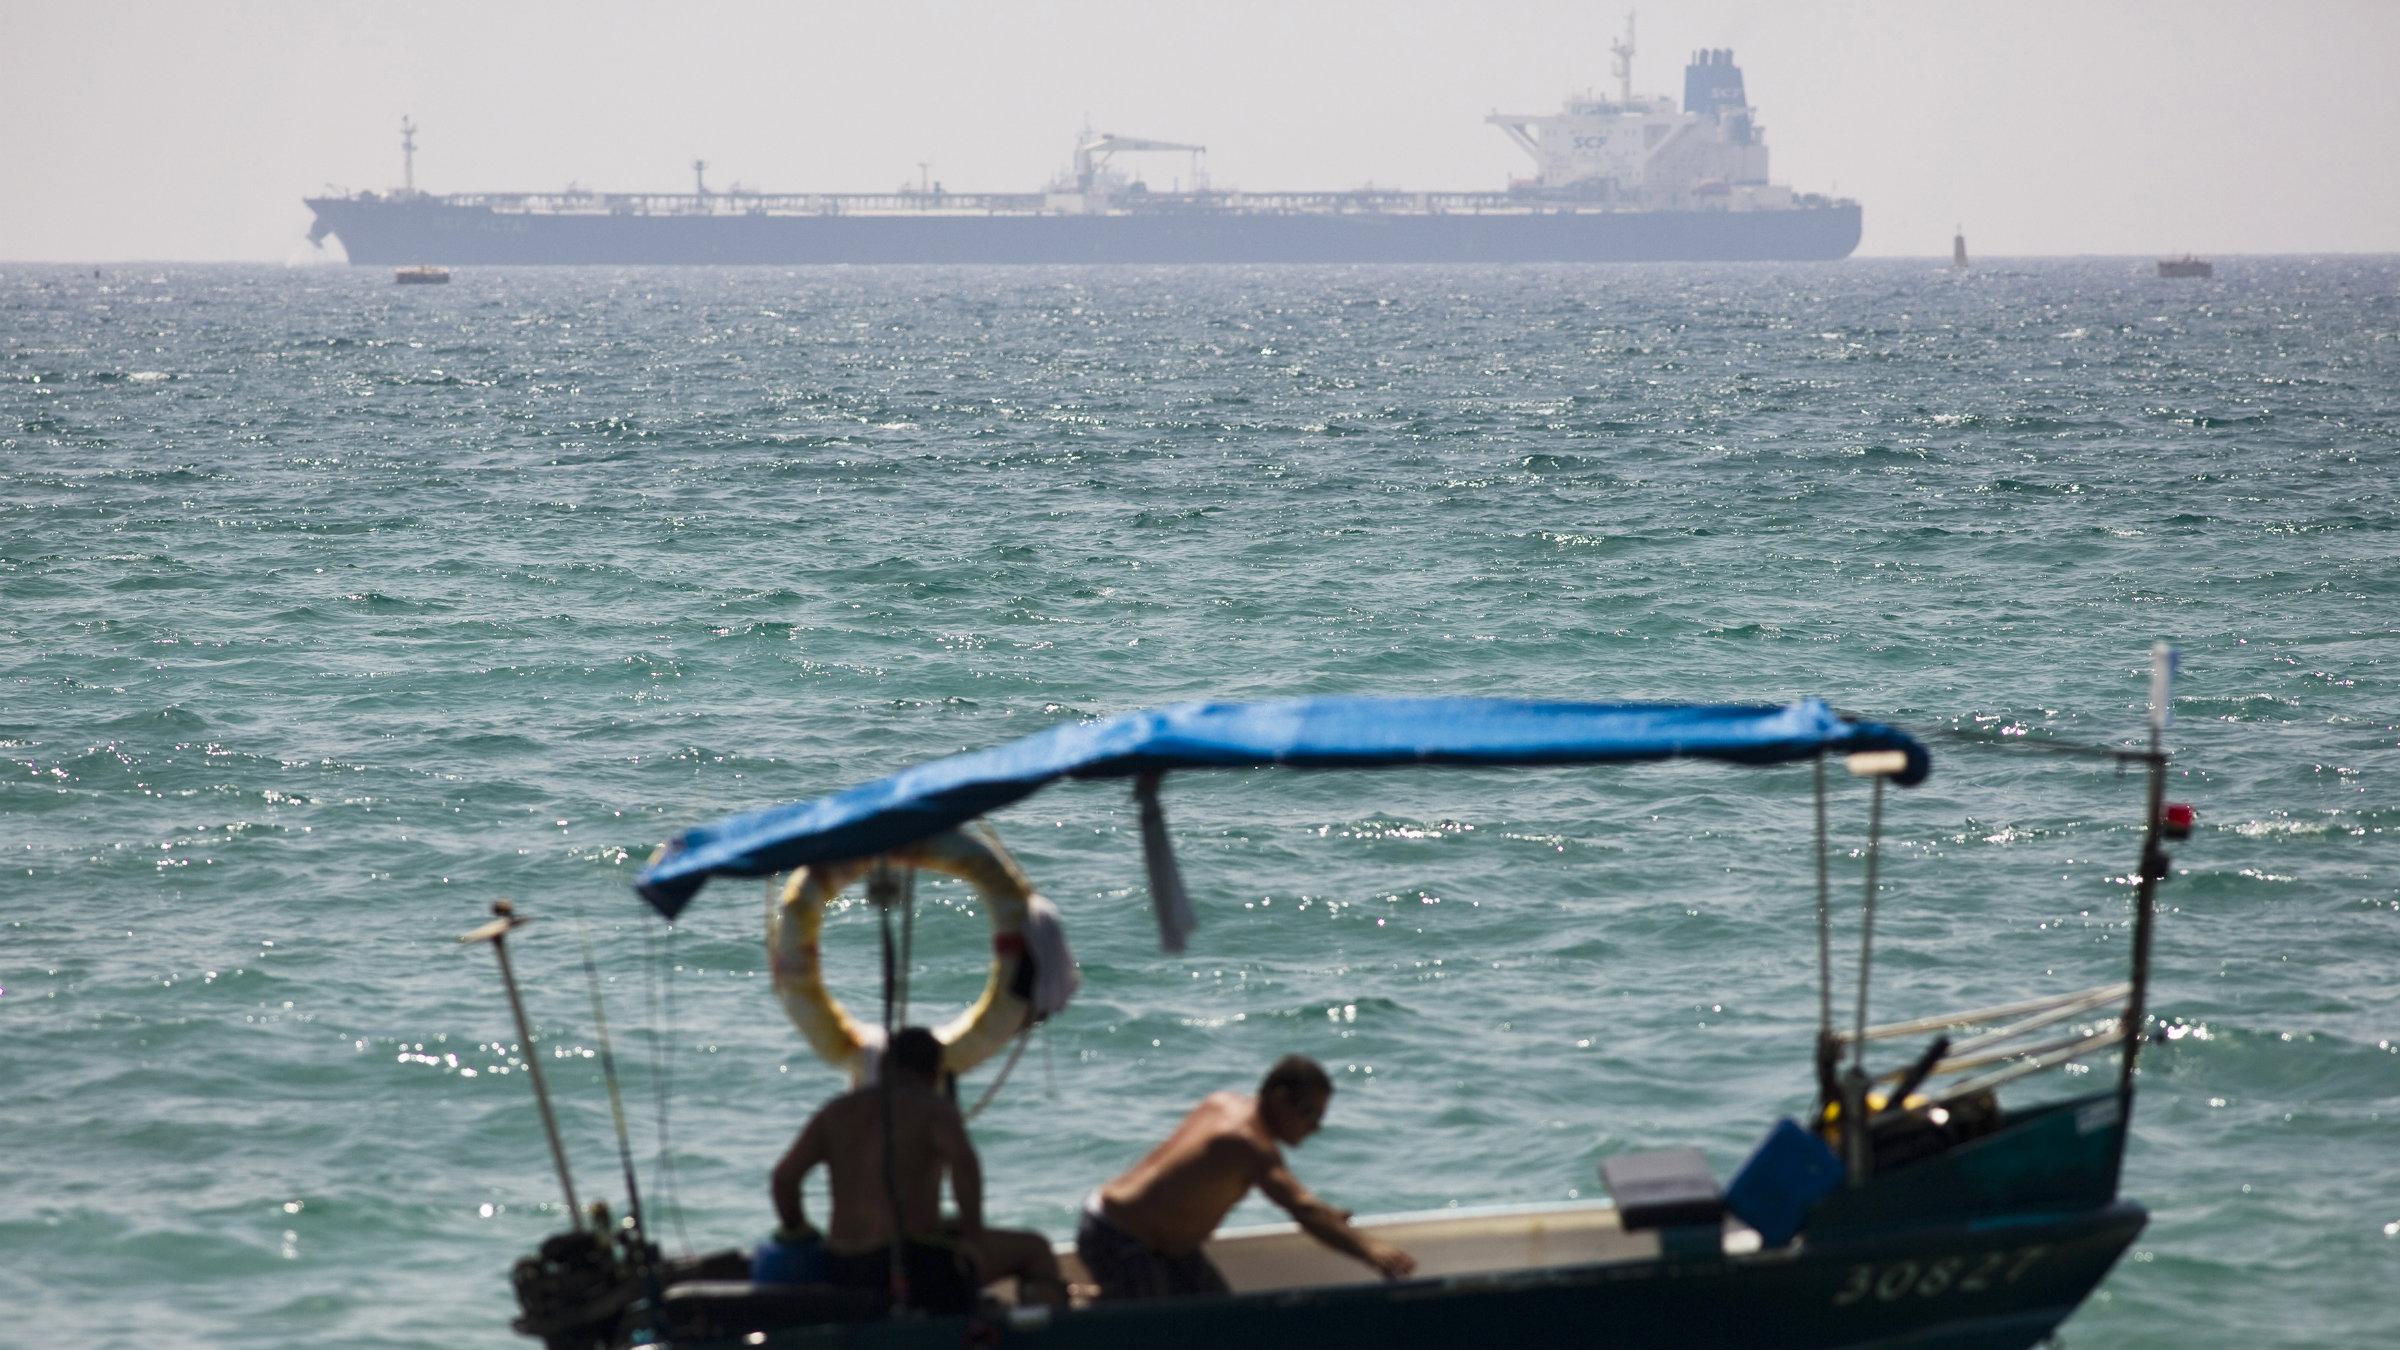 The SCF Altai docks at Ashkelon port in Israel with 1 million barrels of Kurdish crude oil.